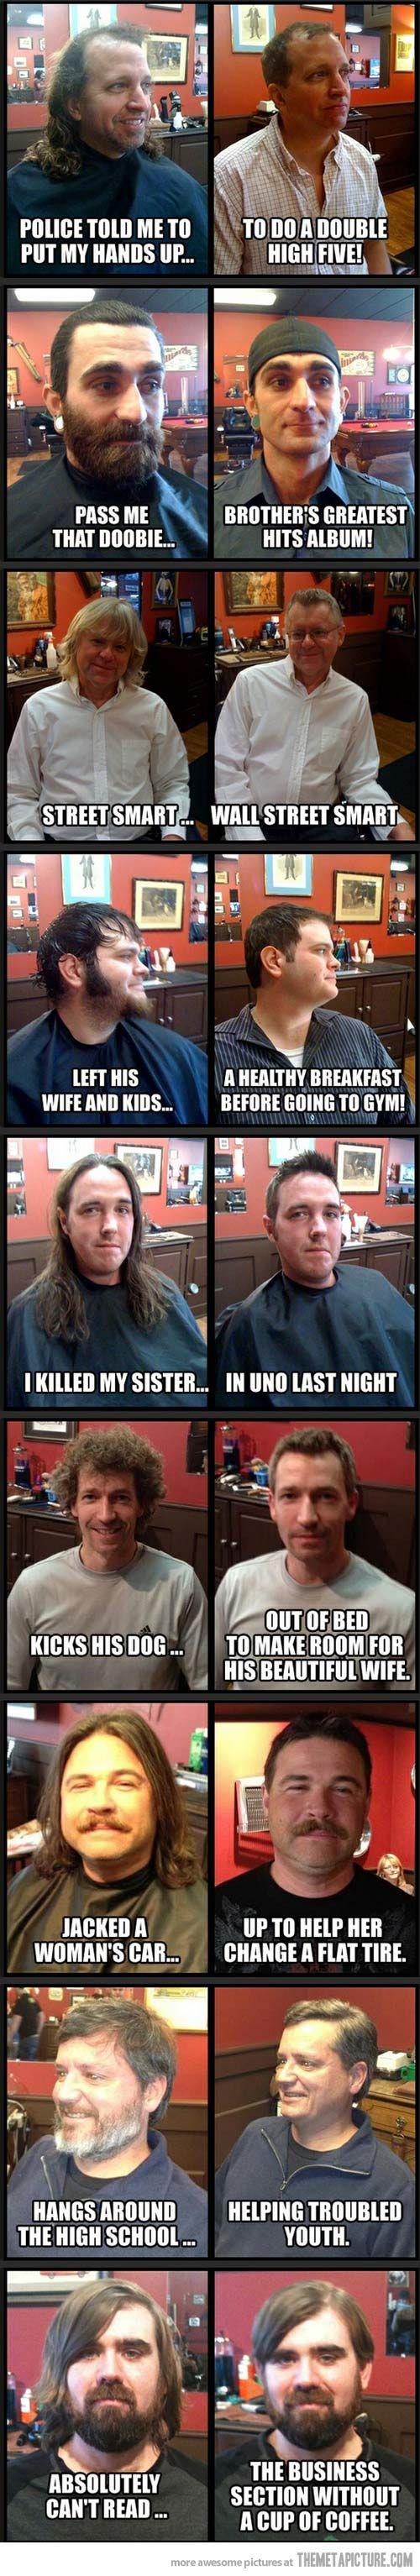 Why haircuts are important…: Shorts Hair, Hair Humor, Men Haircuts, Giggl, Long Hair, Hair Cut, Make A Difference, Funny Stuff, Hilarious